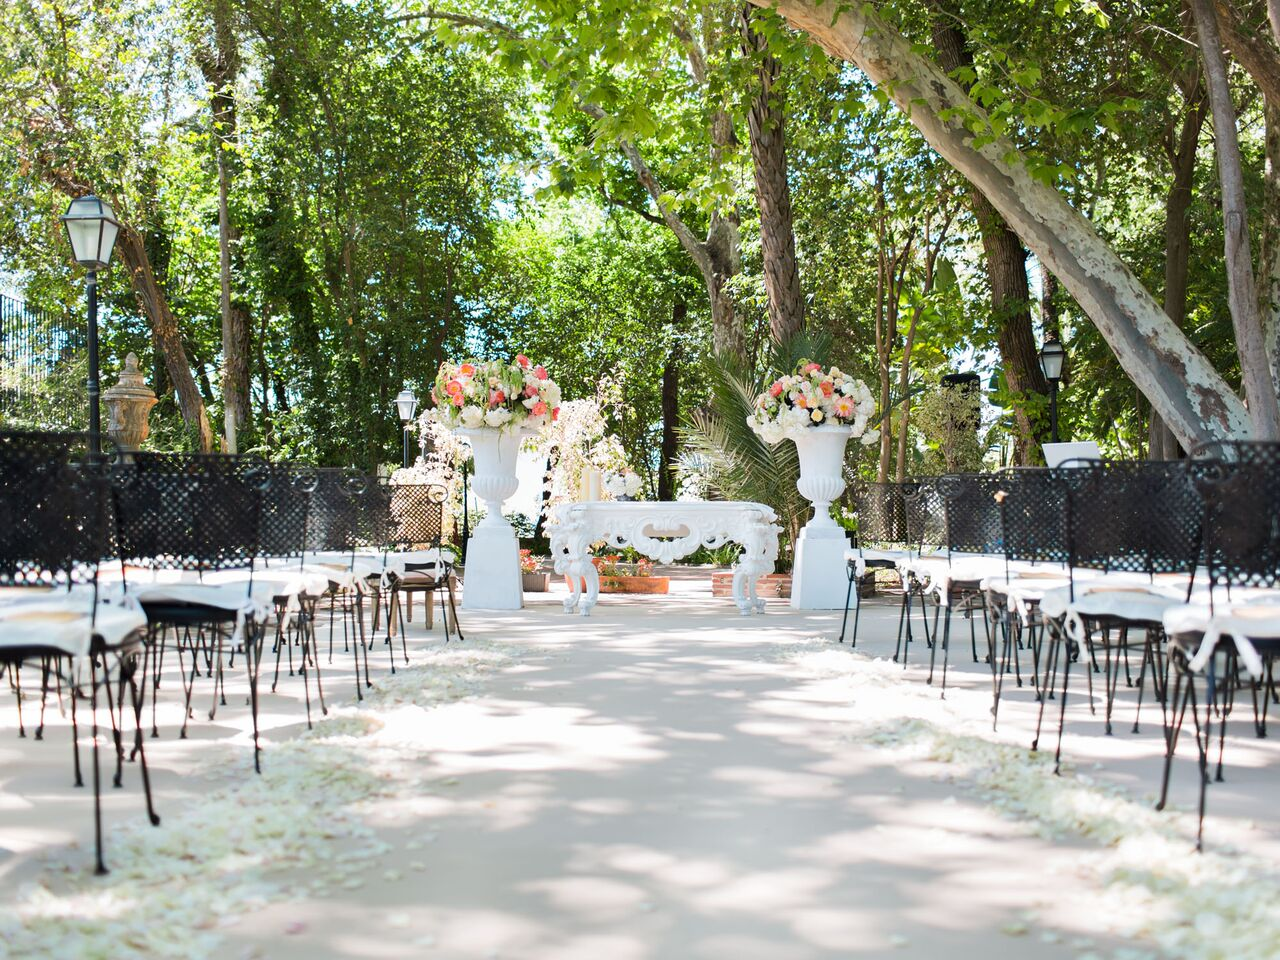 Si-Quiero-Wedding-Planner-By-Sira-Antequera-Paola-Pedro-1